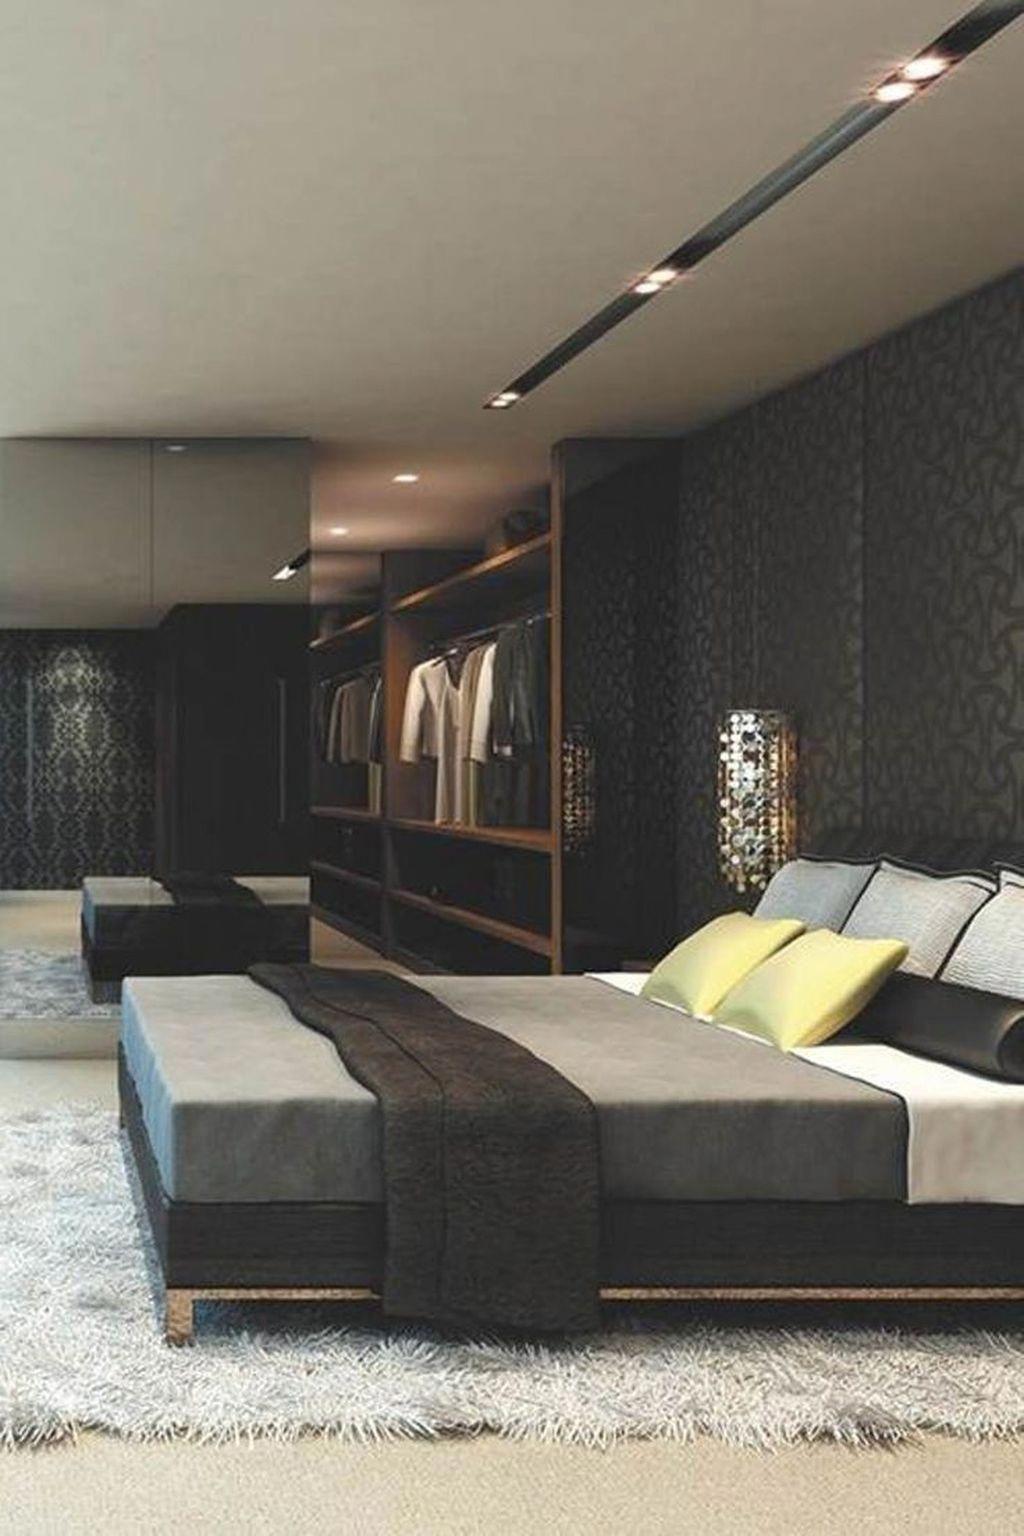 Awesome 20 Modern Bedroom Decorating Ideas For Men Modern Mens Bedroom Grey With D Luxury Bedroom Master Masculine Bedroom Design Minimalist Bedroom Design